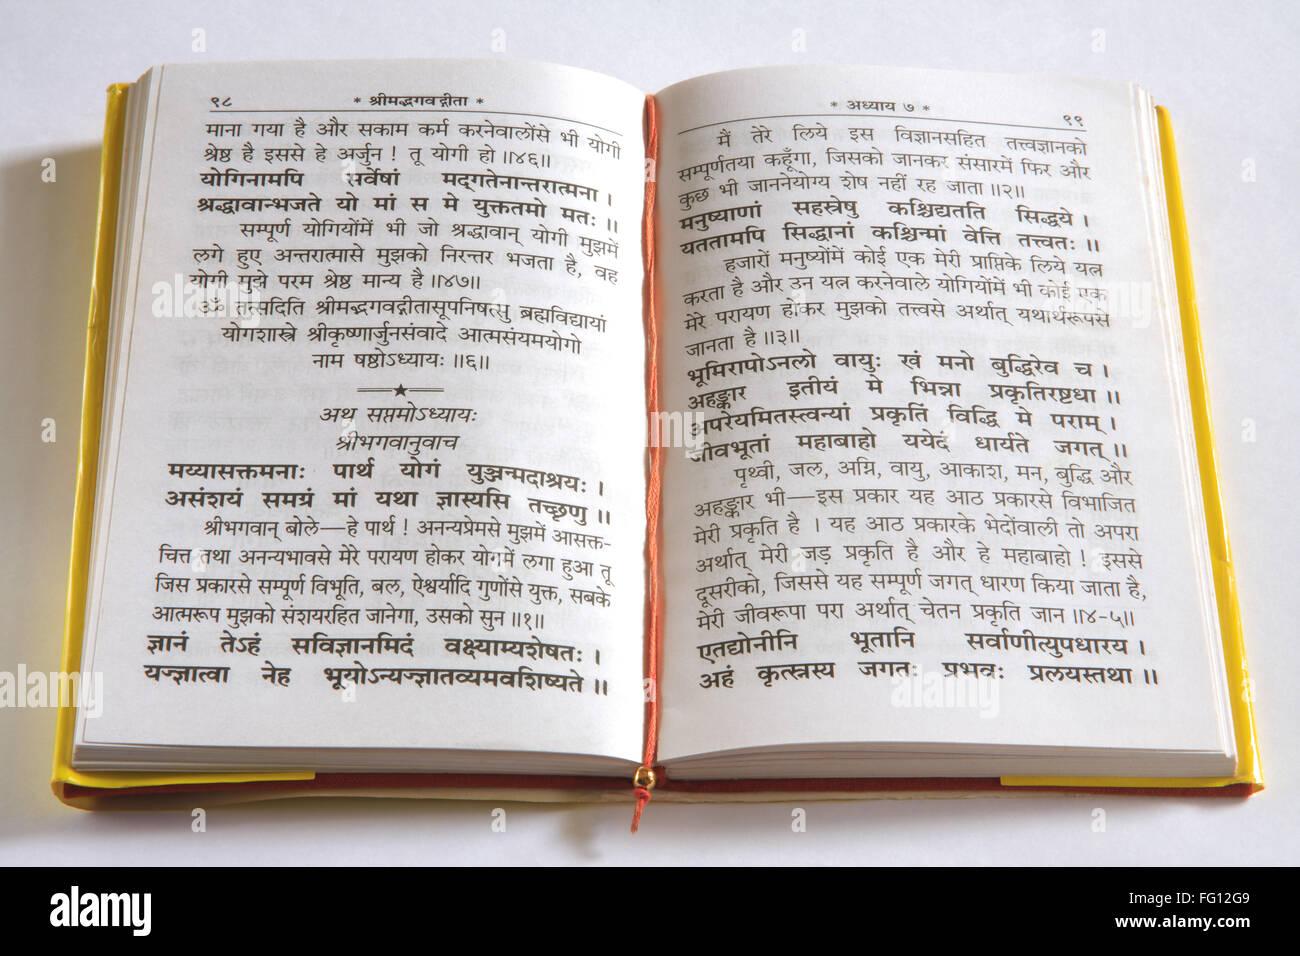 Bhagavad Gita Stock Photos & Bhagavad Gita Stock Images - Alamy